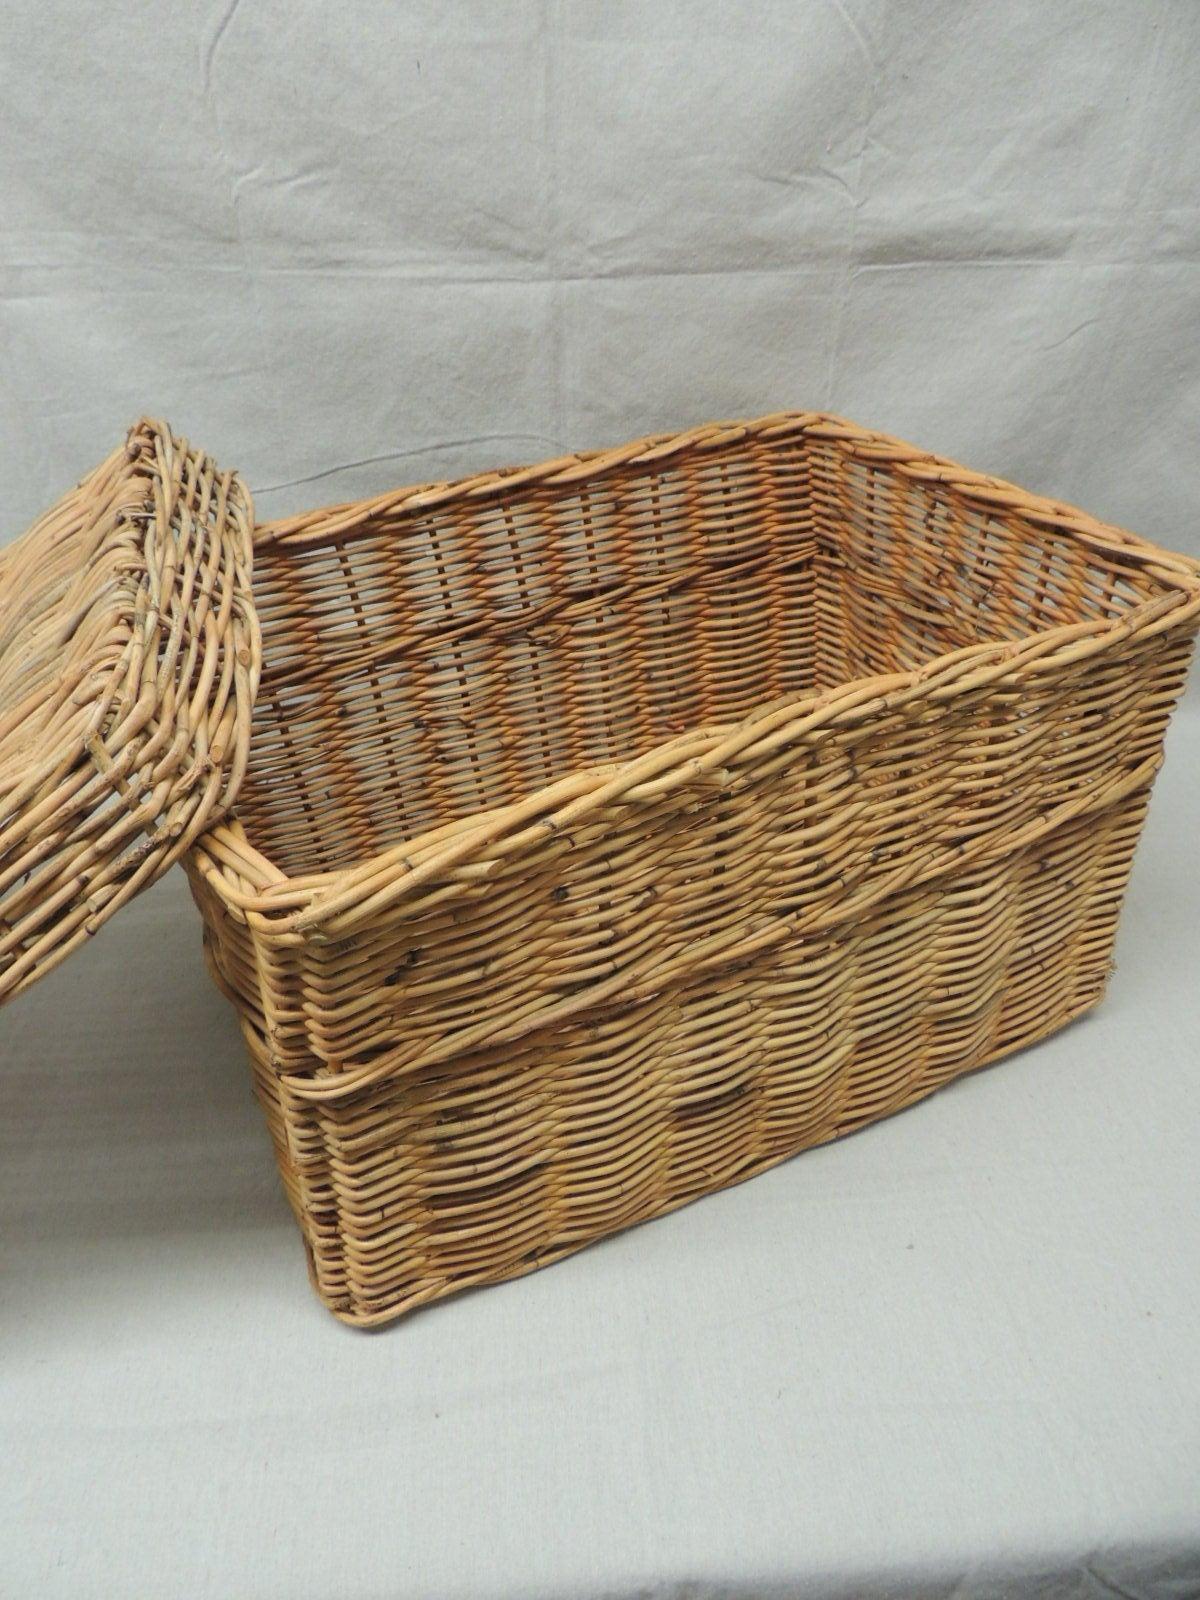 Tall decorative wicker baskets :